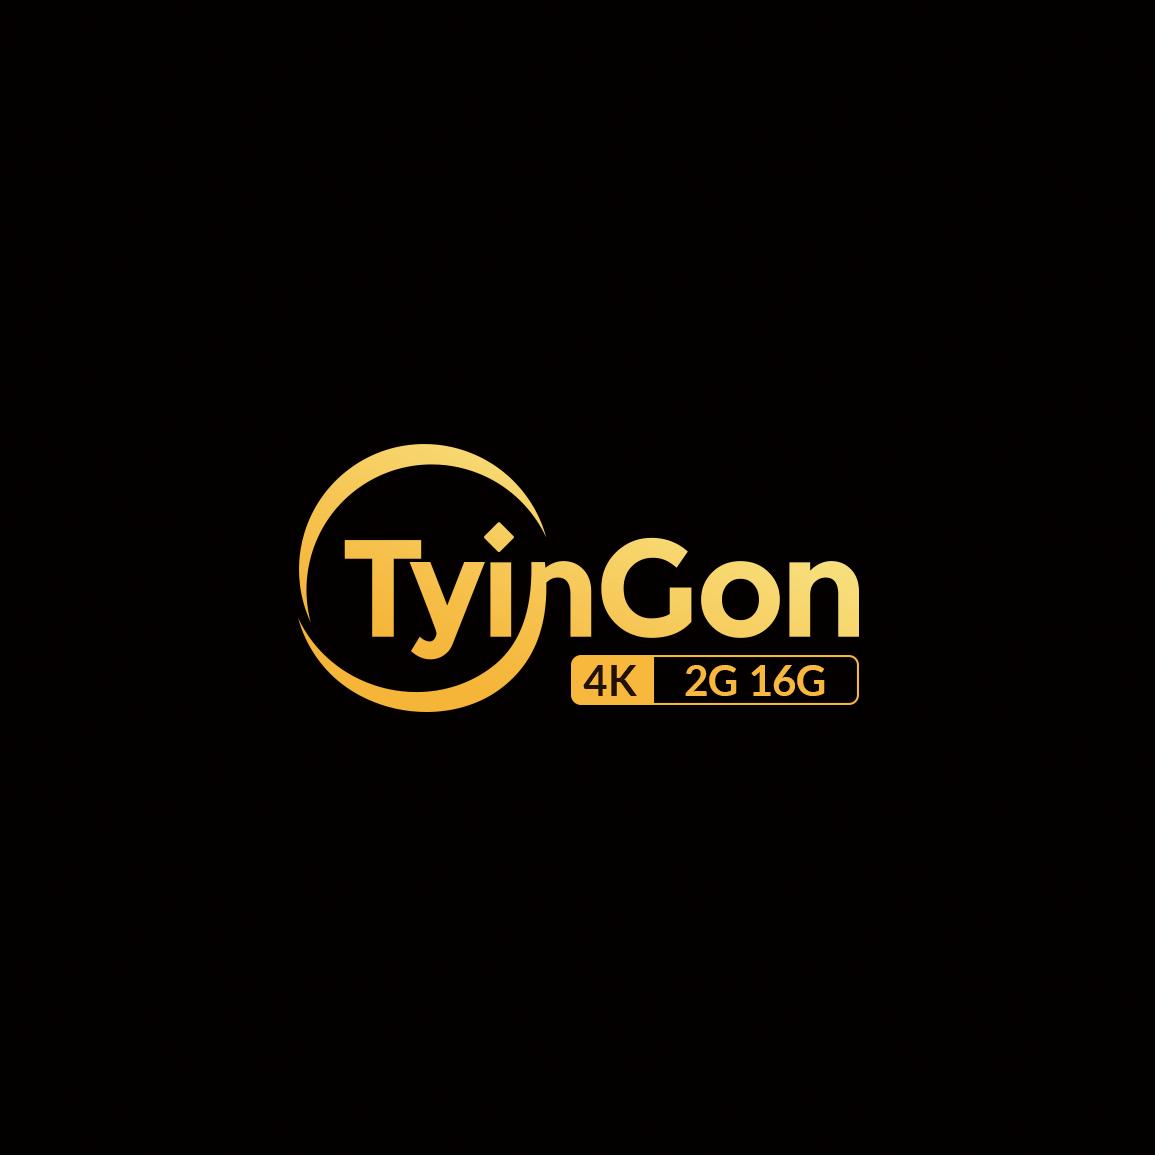 Sp TyinGon Android tv box 2g 16g reproductor de medios